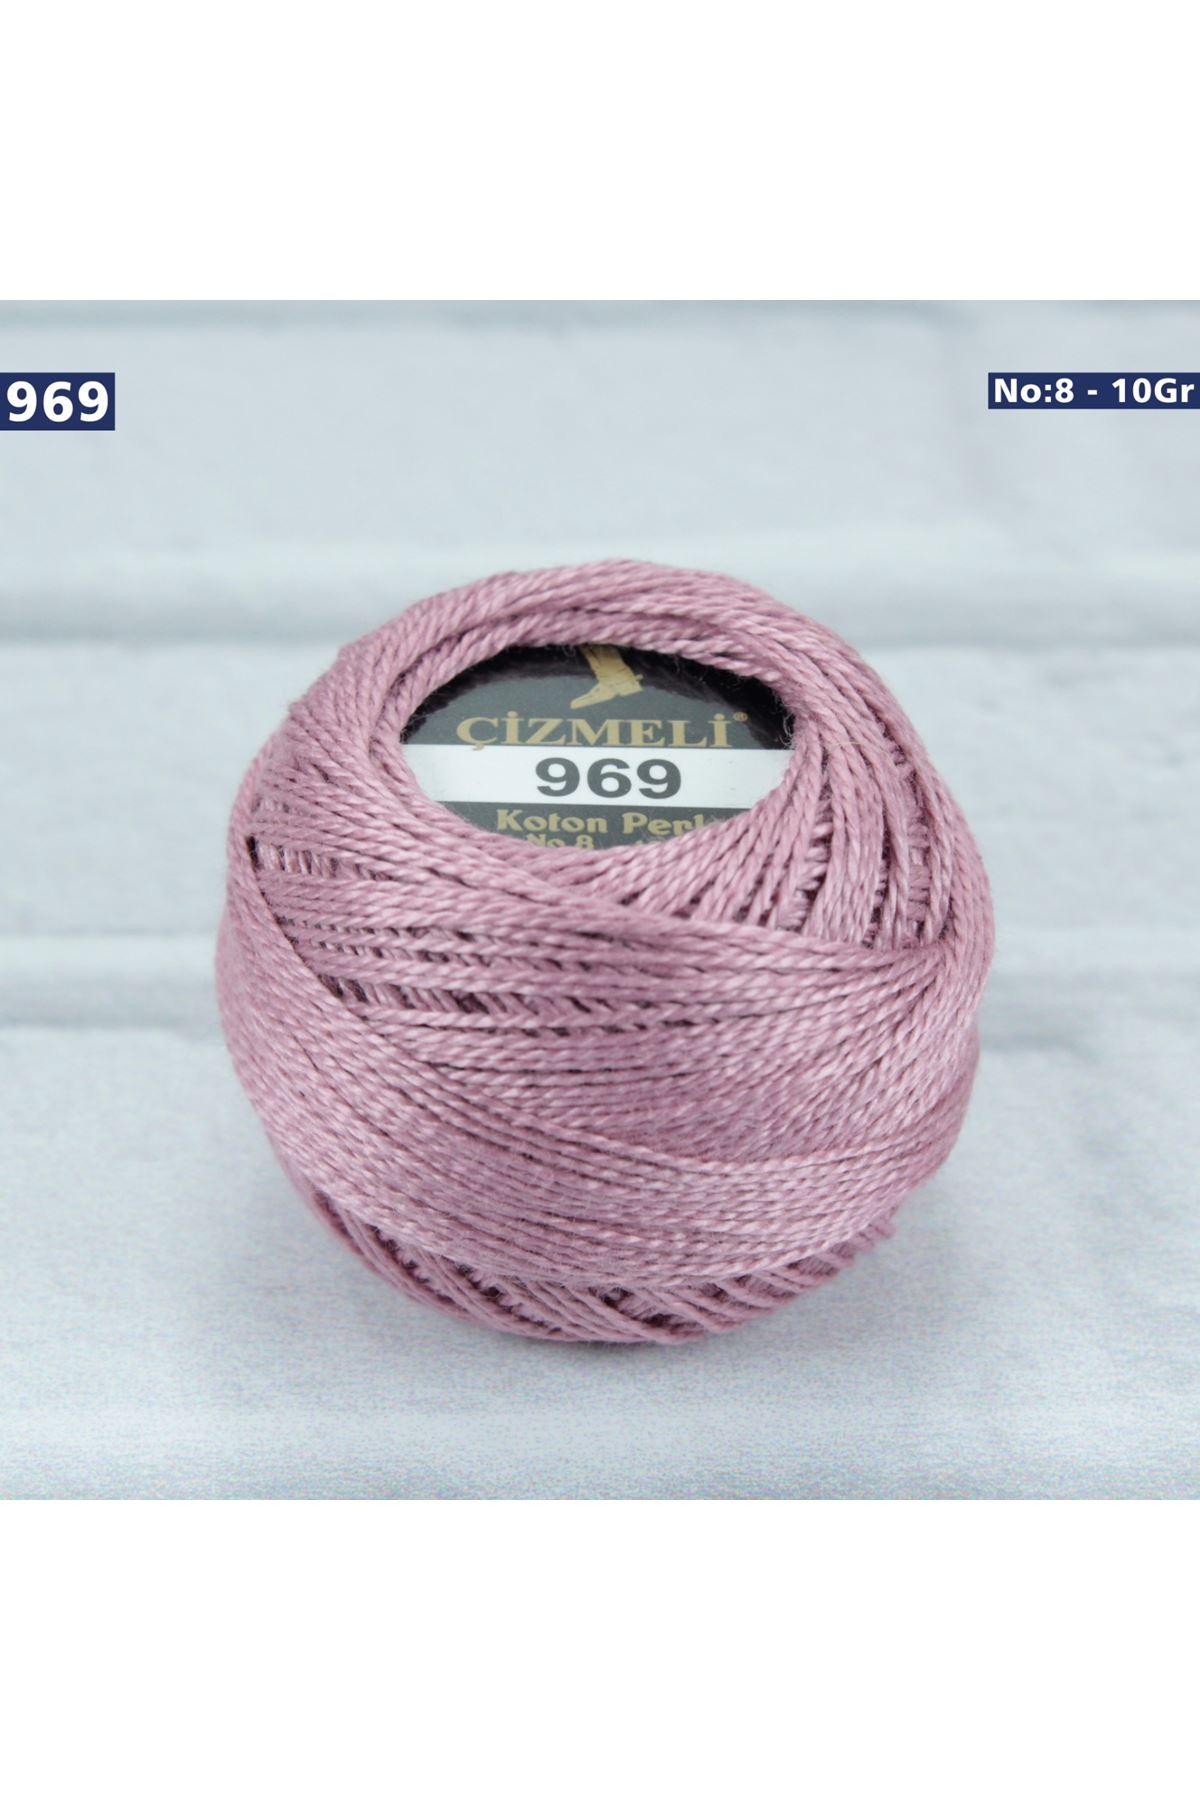 Çizmeli Cotton Perle Nakış İpliği No: 969